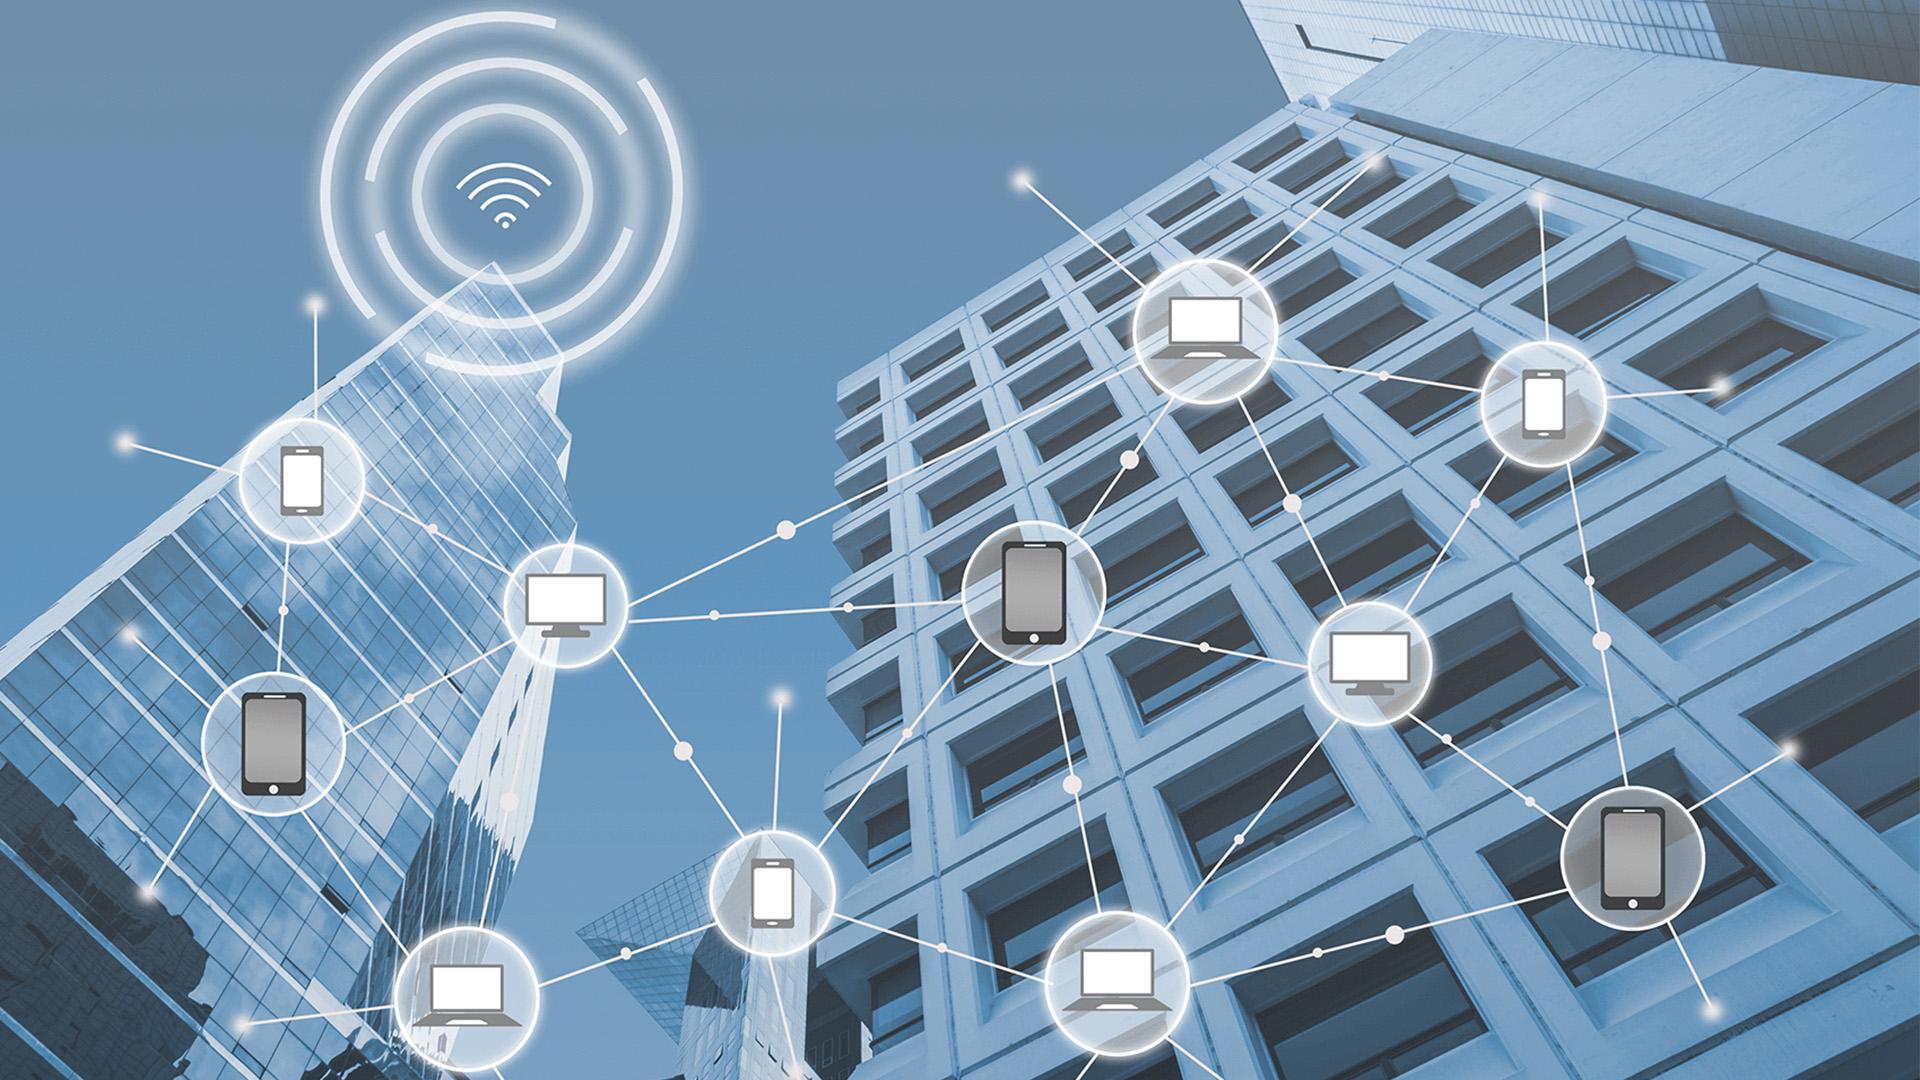 Smart-building technology gets a PKI boost